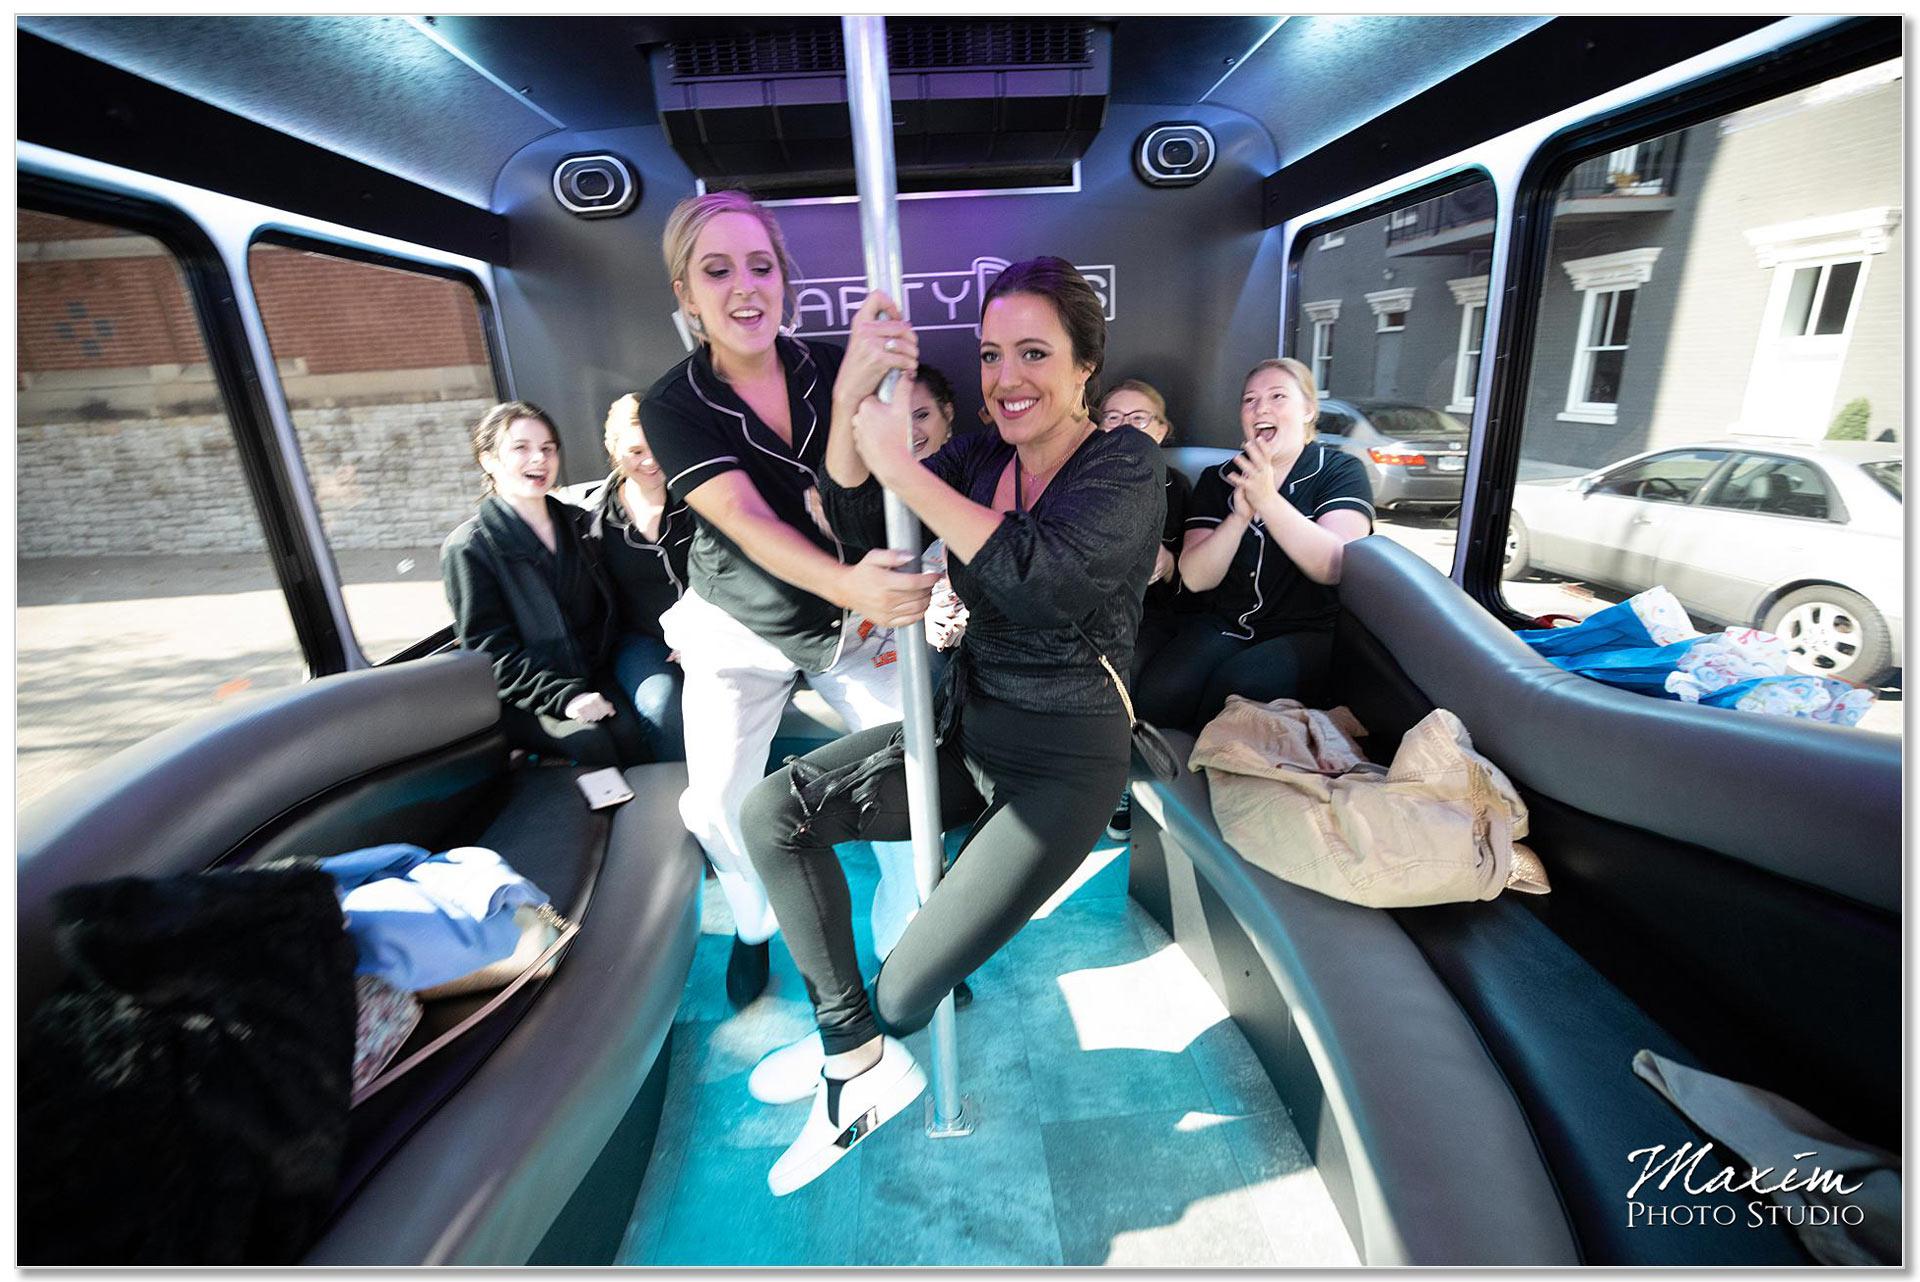 My Party bus bridesmaids